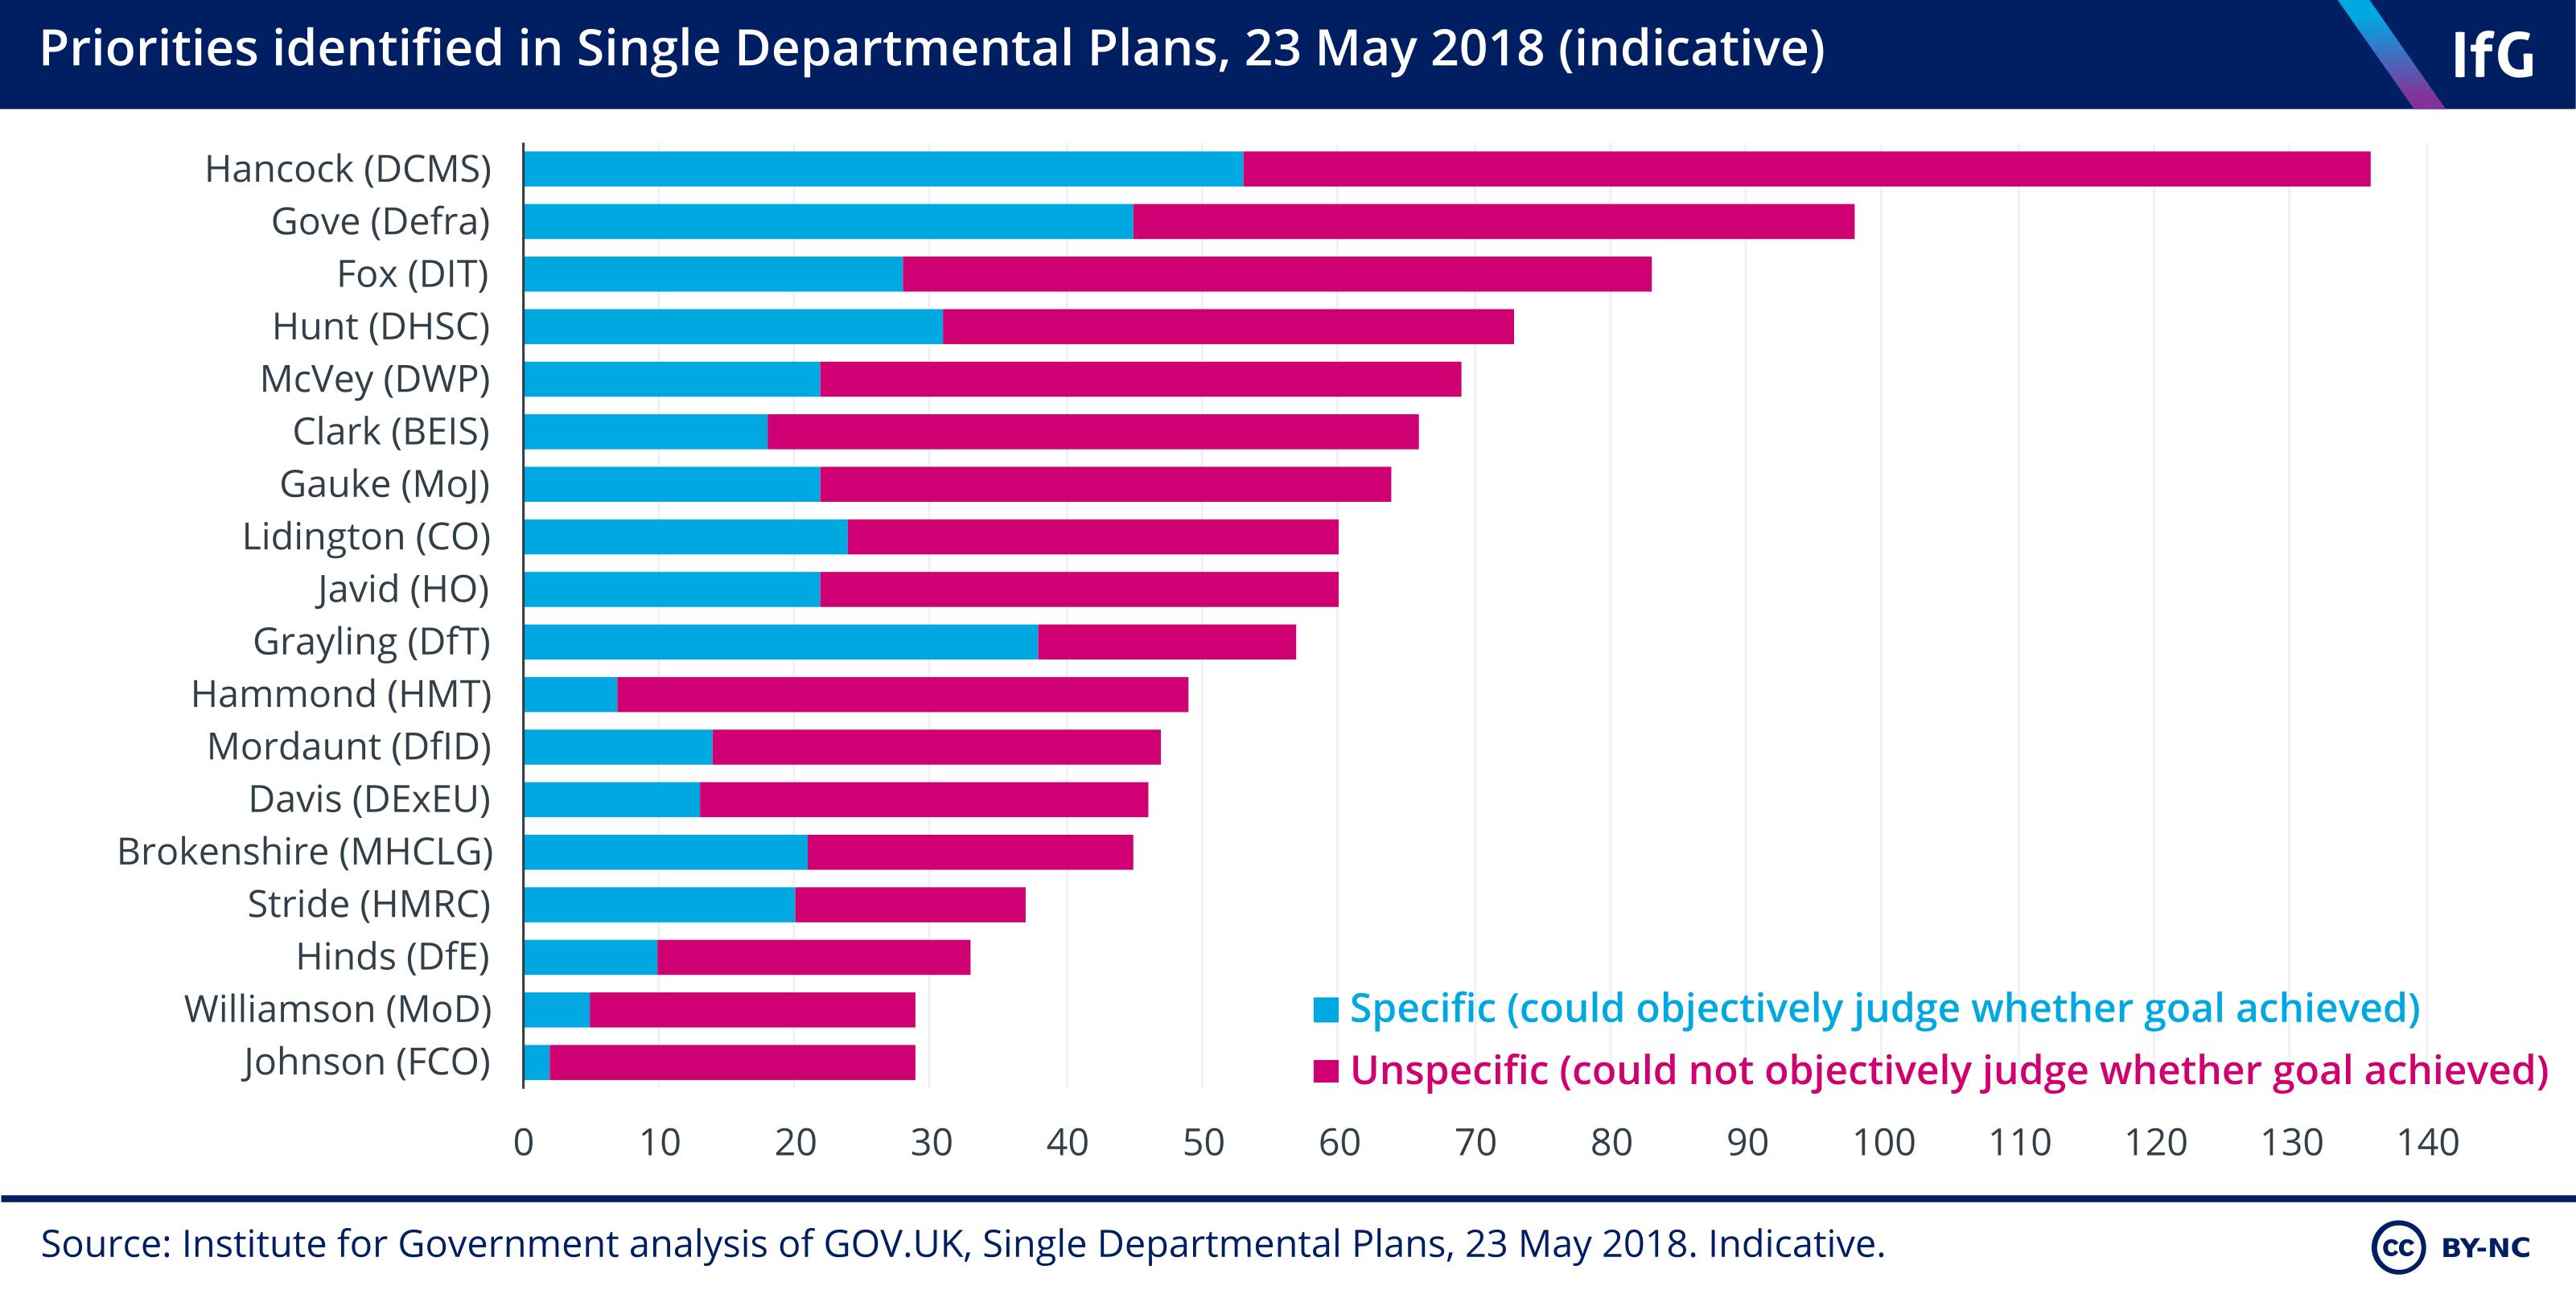 SDP priorities - May 2018